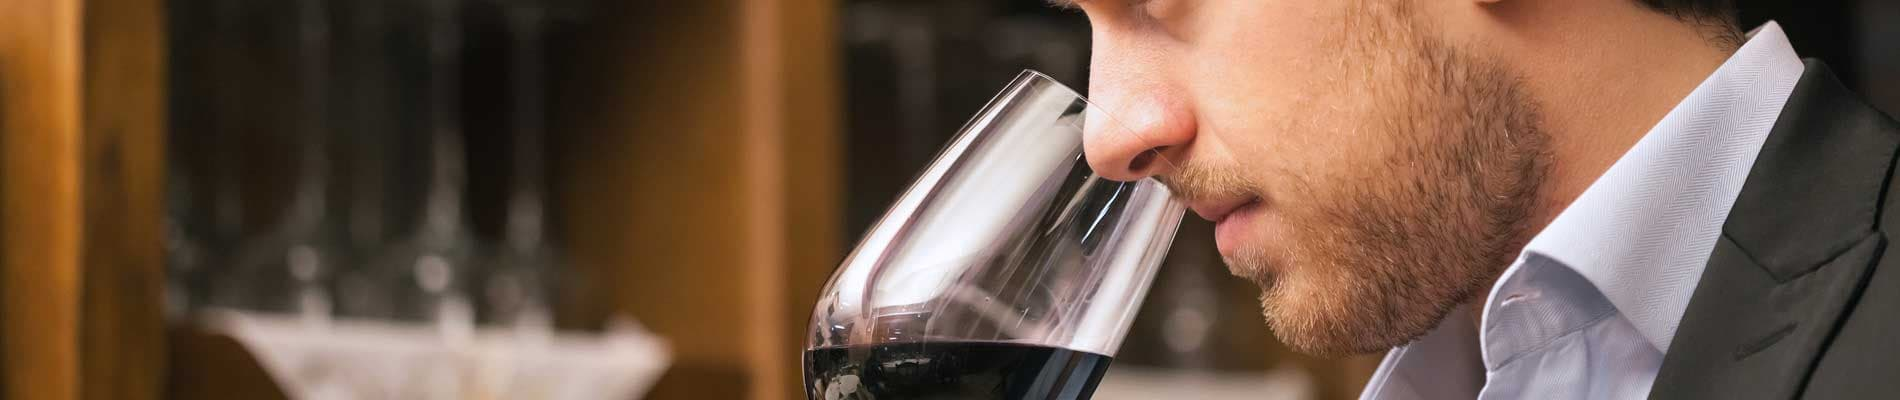 Sommeliers i tast de vins